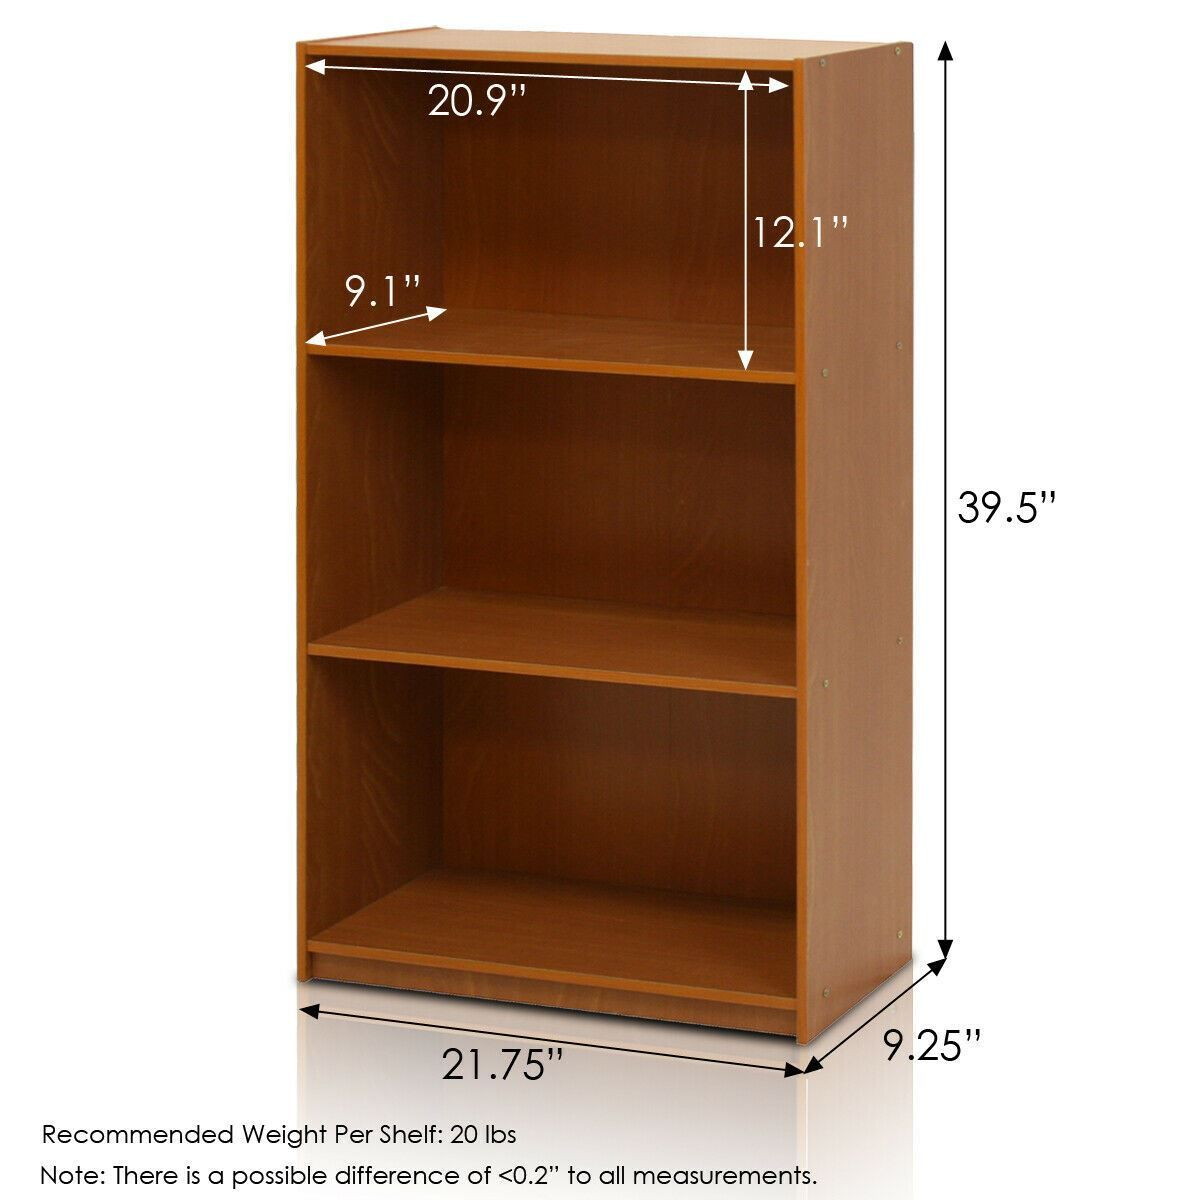 Furinno Basic 3 Tier Bookcase Storage Shelves, Light Cherry,Decorations